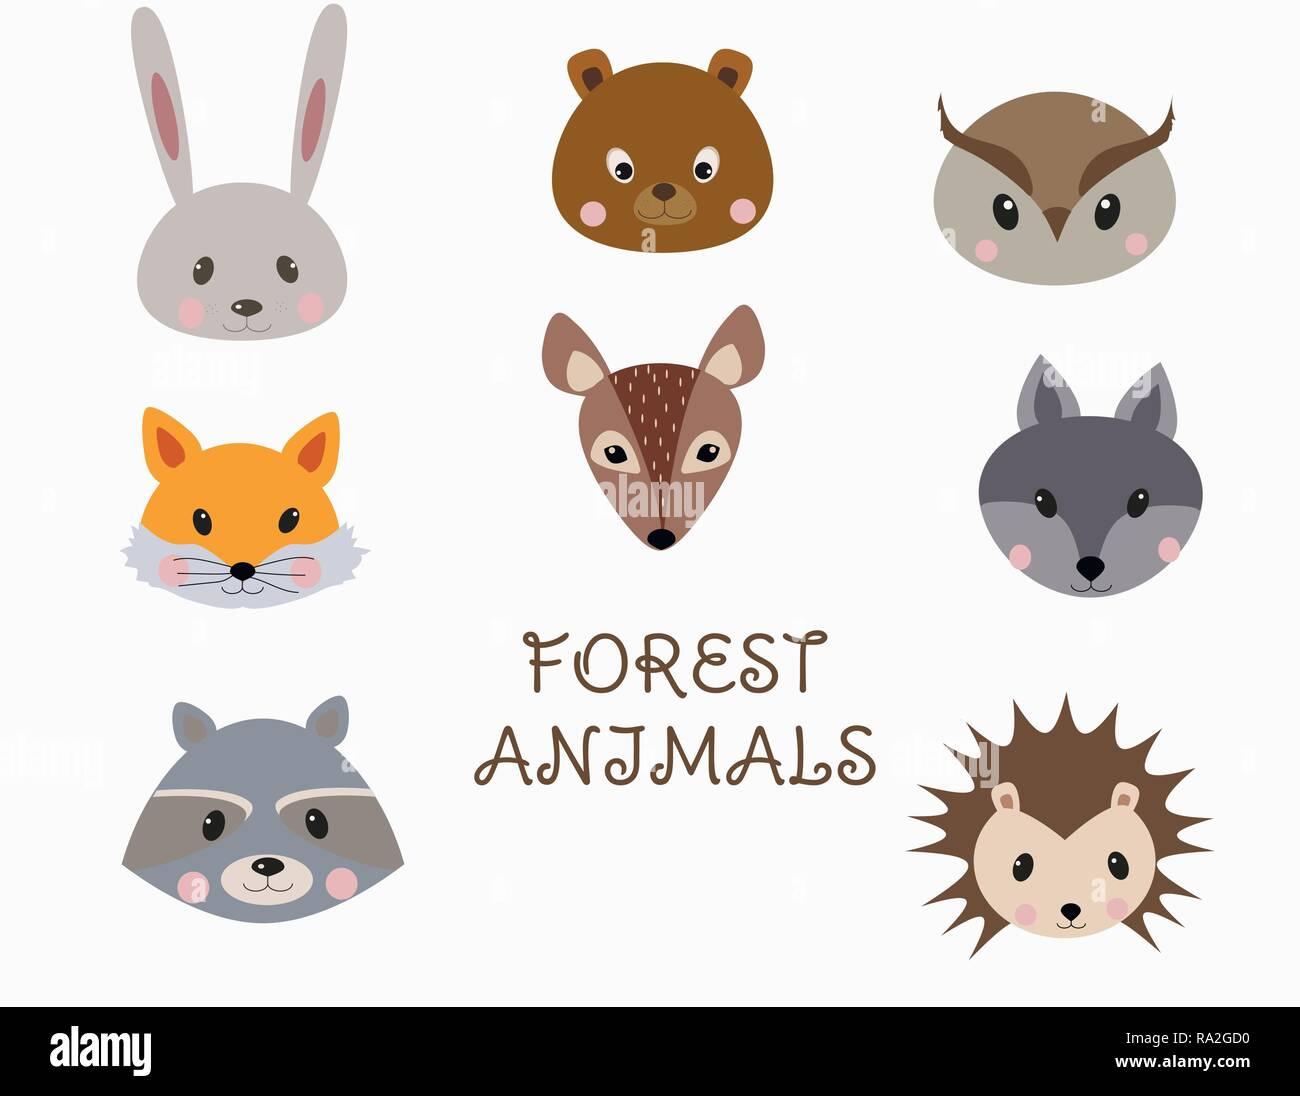 Set of forest animals faces. Woodland cartoon animals rabbit, raccoon, fox, bear, wolf, hedgehog, deer, owl. Vector Stock Vector